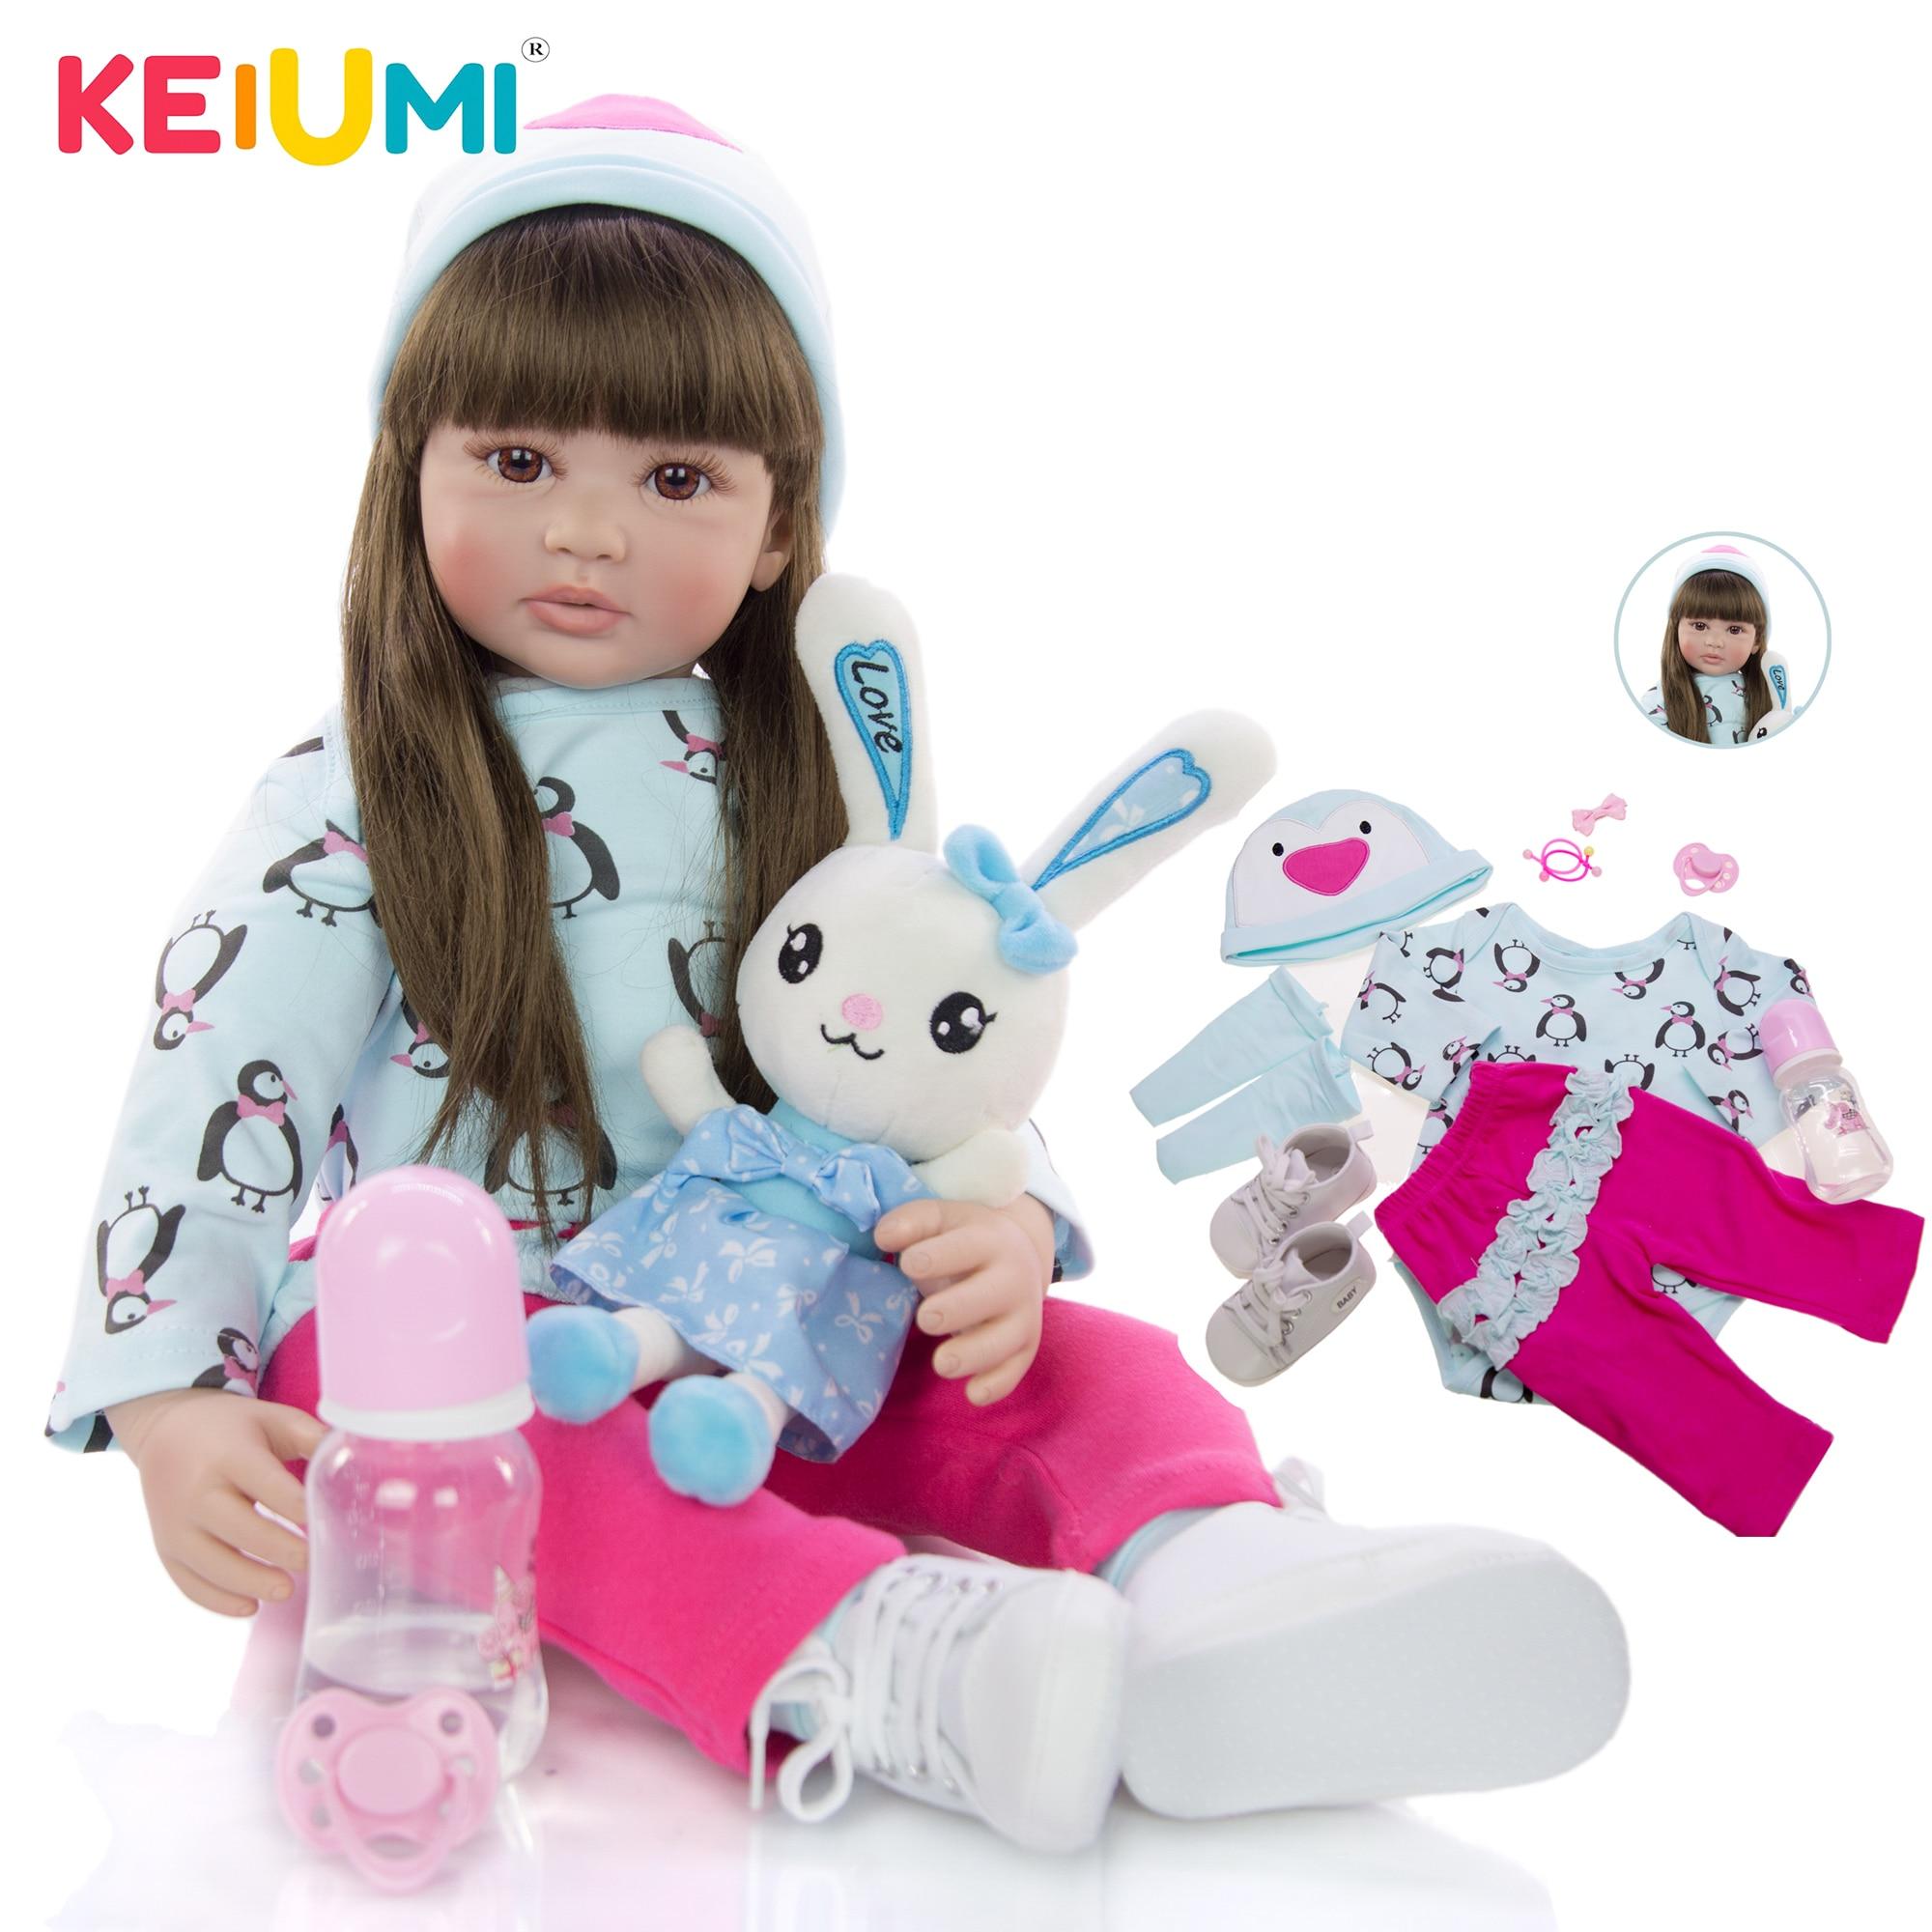 24 Inch Fashion Reborn Dolls Menina Long Hair Truth Like 60 cm Princess Reborn Boneca Stuffed Doll Baby Toy Child Birthday Gifts